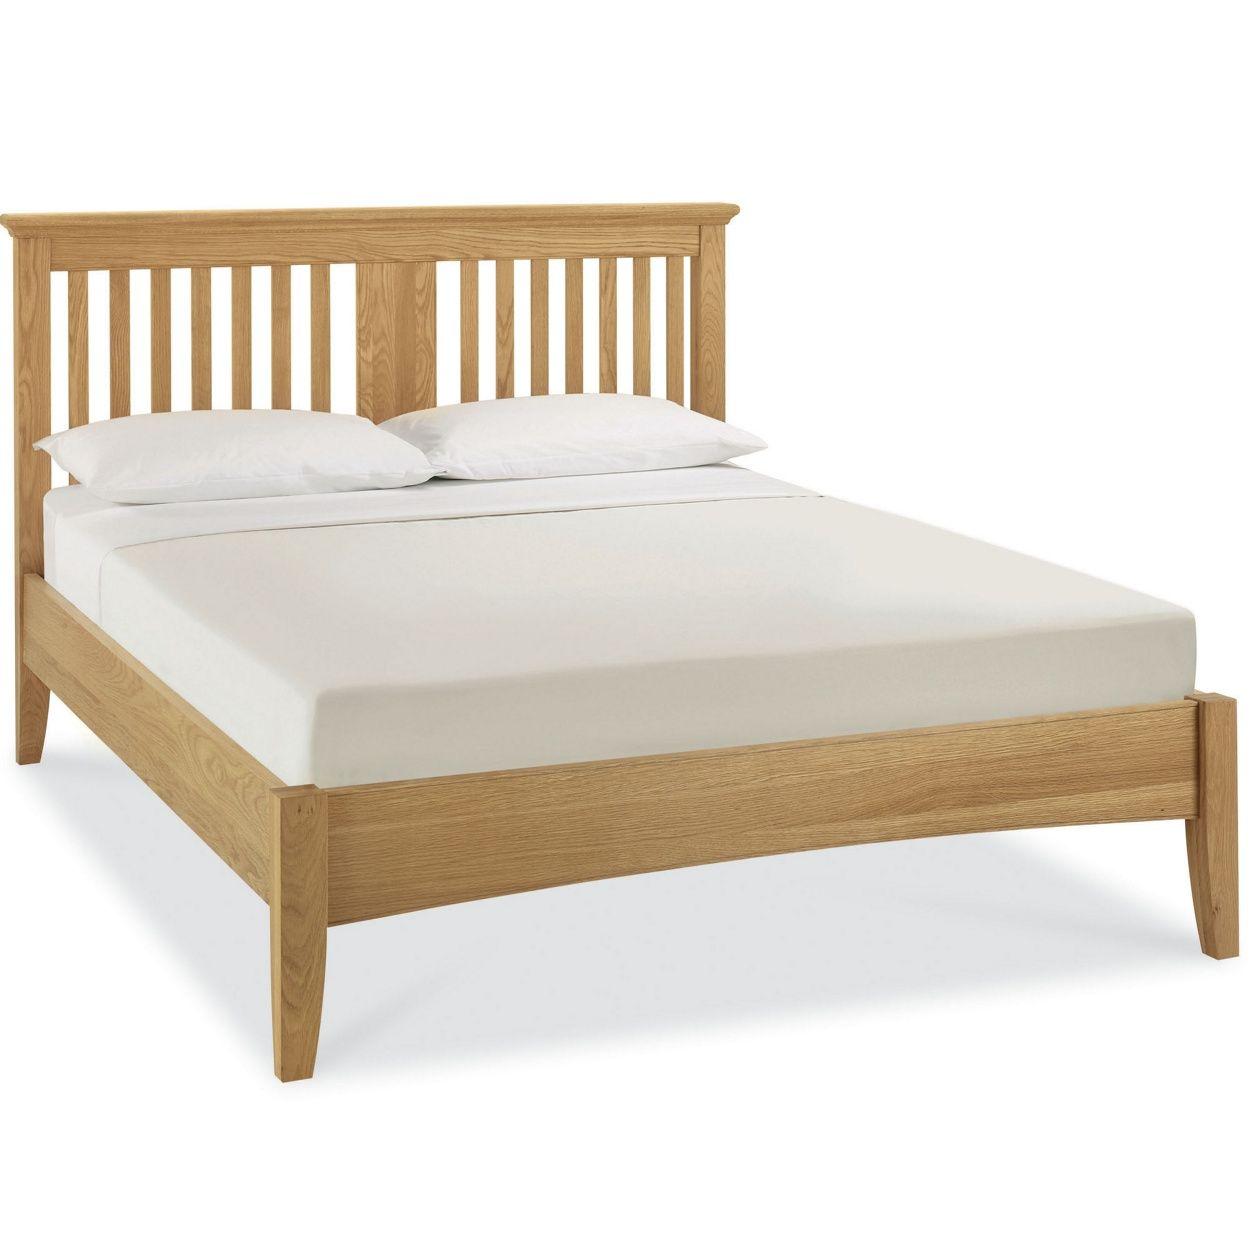 Debenhams Oak \'Hampstead\' bed frame | Debenhams | Bed and Bath ...